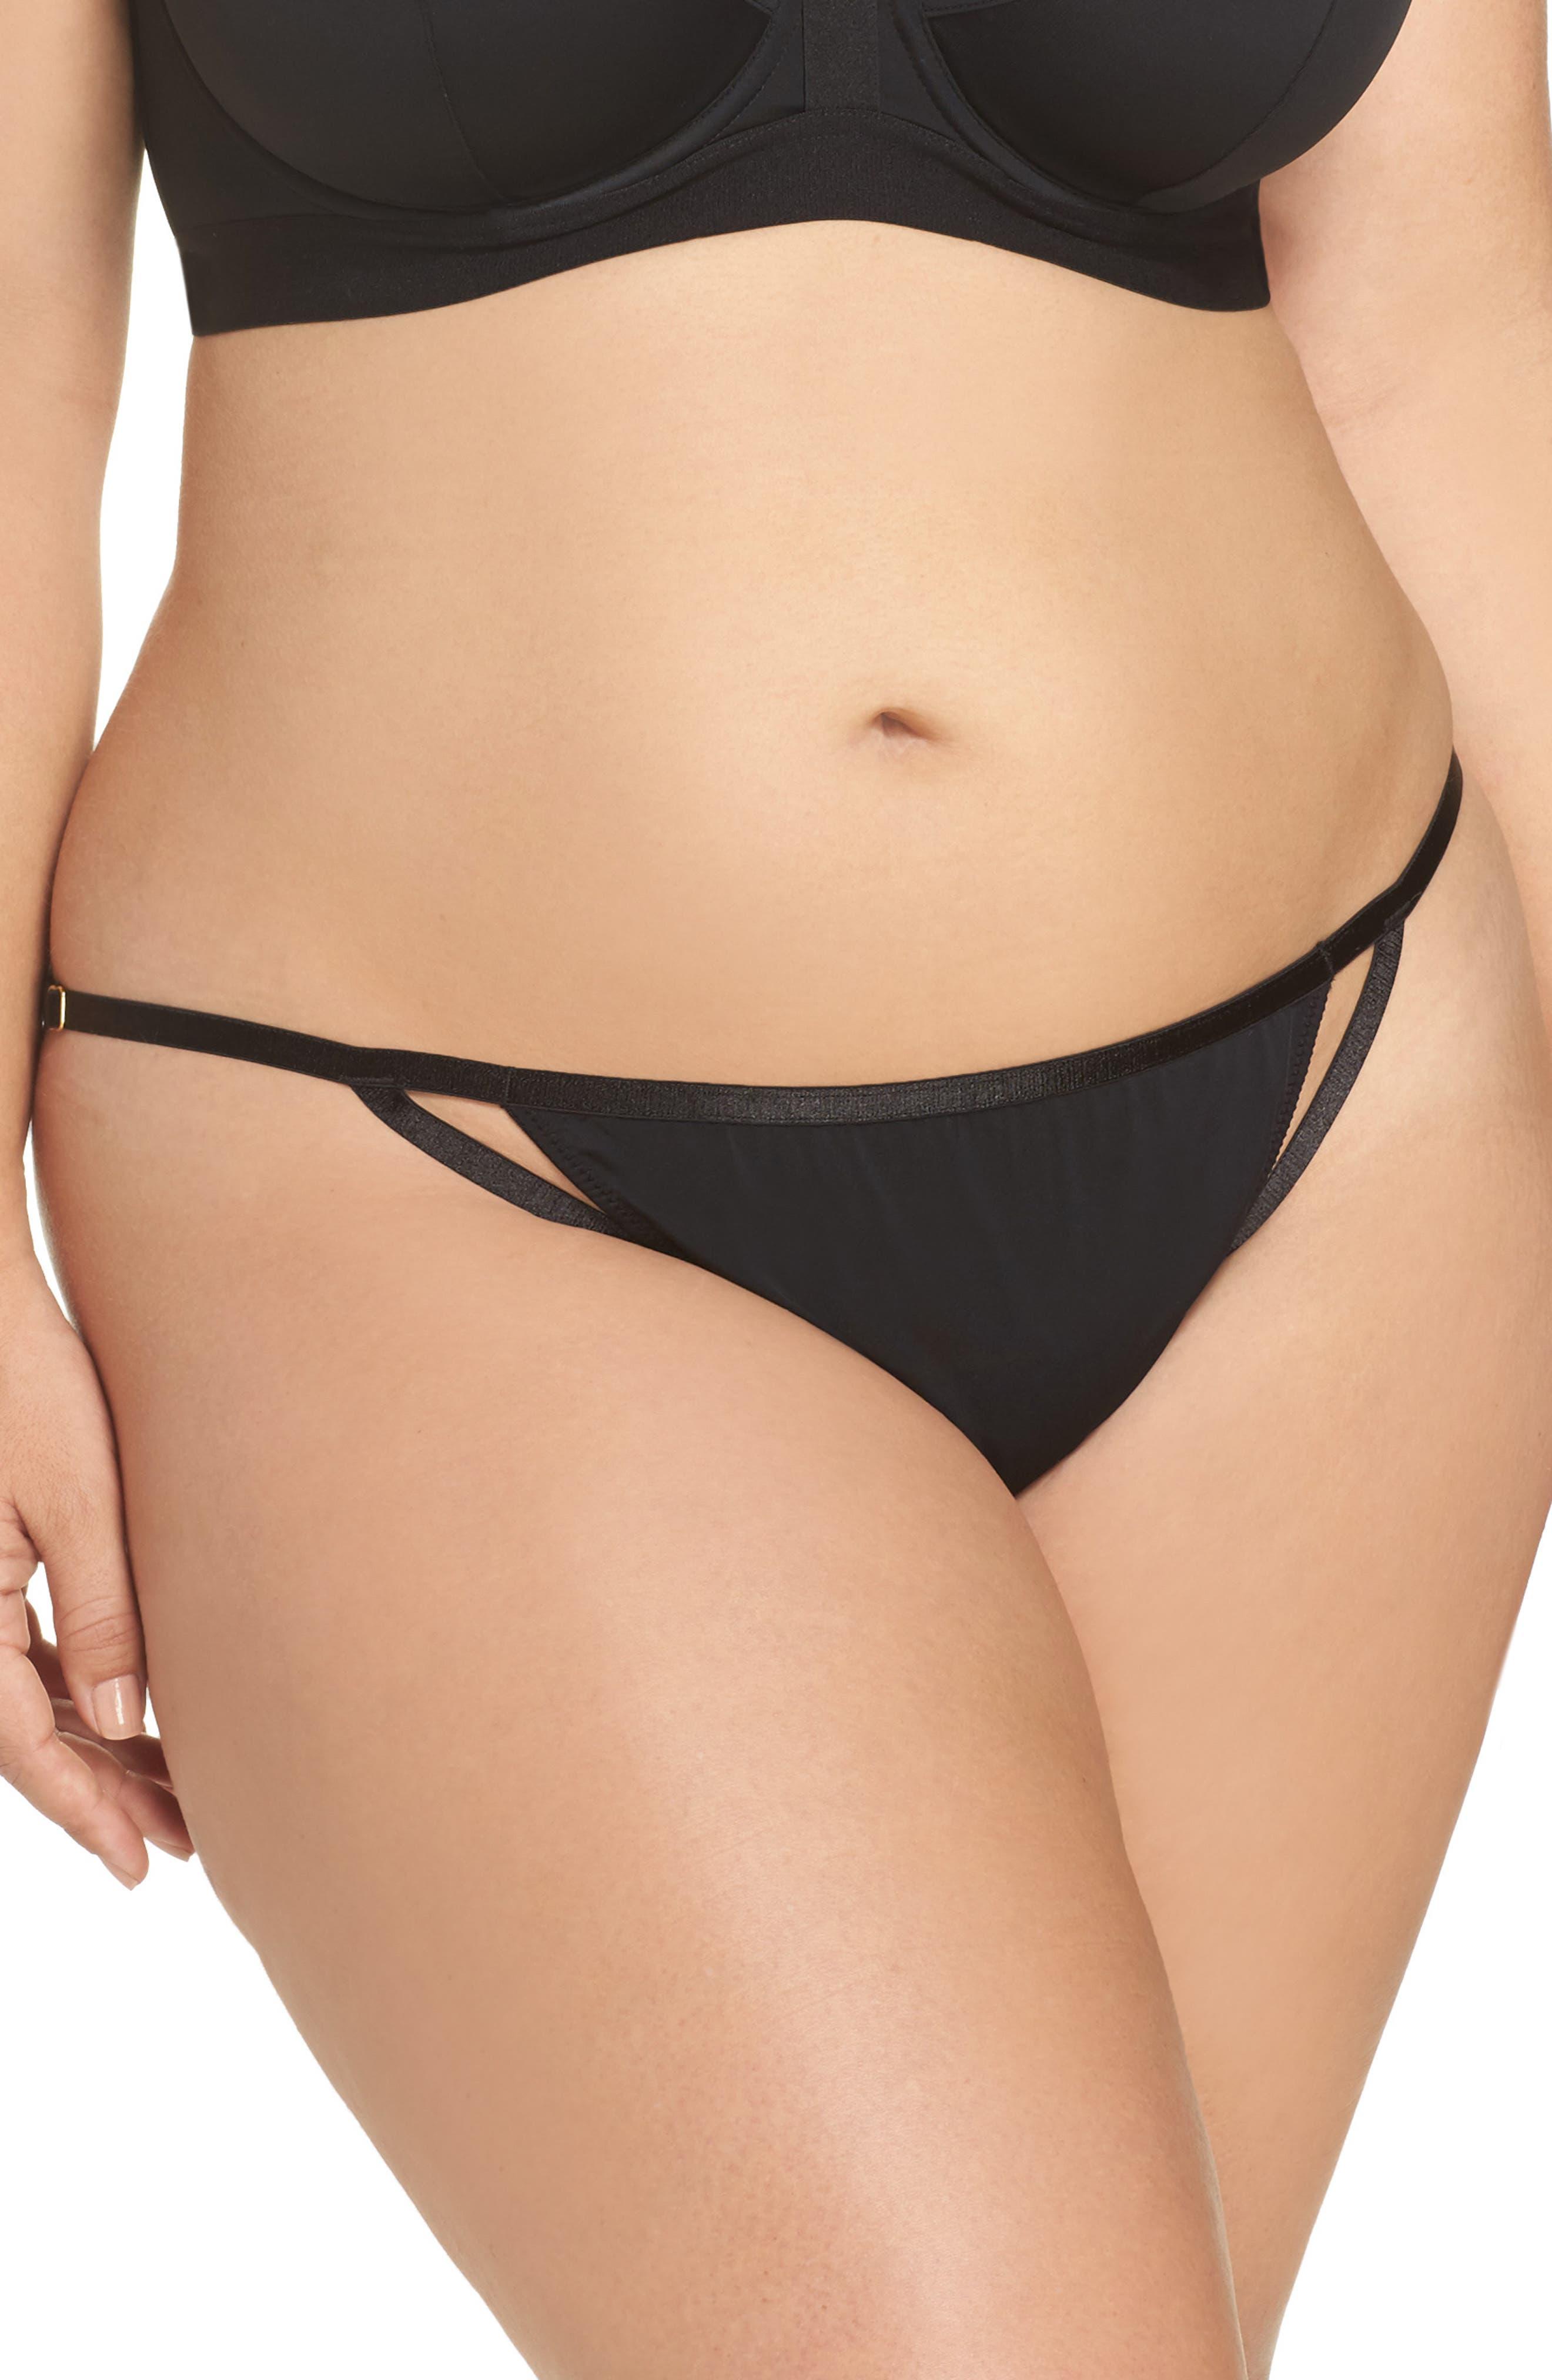 Gabi Fresh x Playful Promises Strappy Bikini (Plus Size)